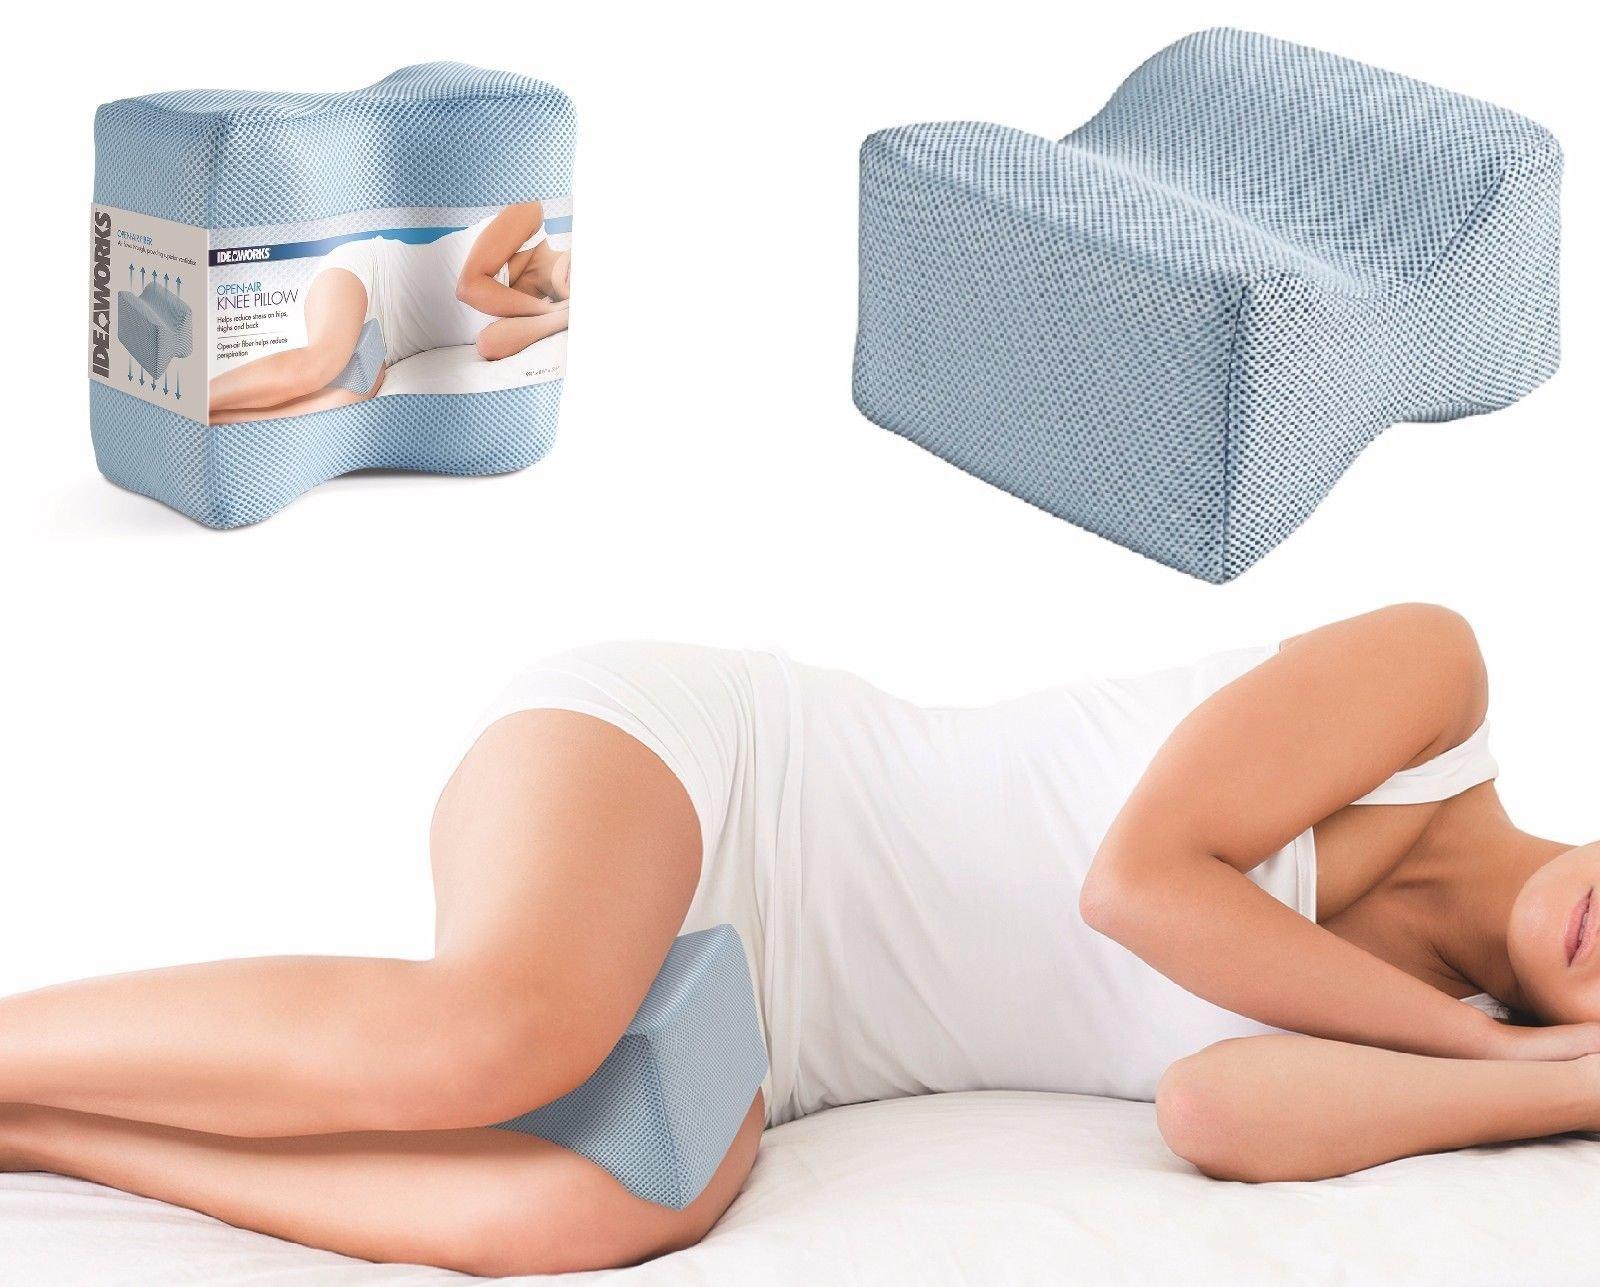 Home Spa Knee Pillow Velvet Foam Orthopedic Contour Knee Hips Thigh Back Relief